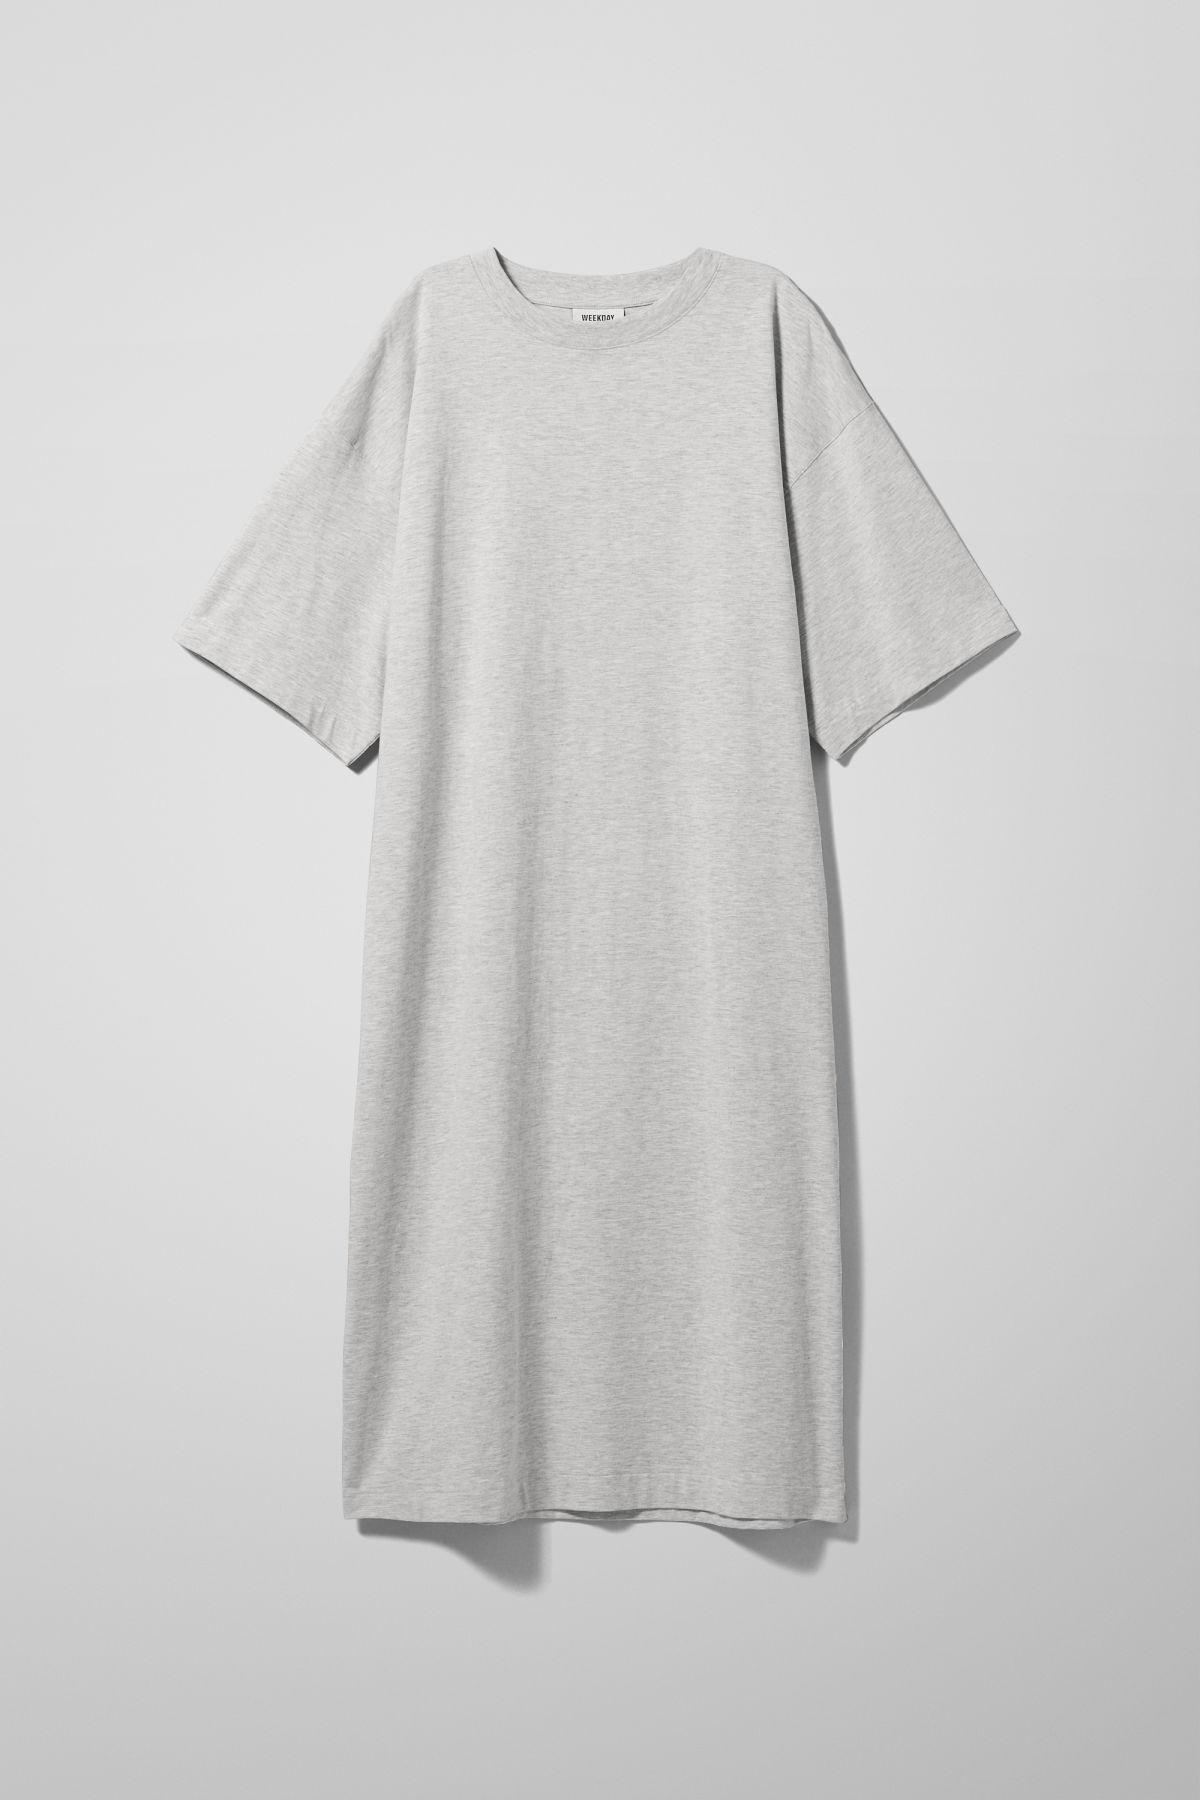 Image of Ines T-Shirt Dress - Grey-M